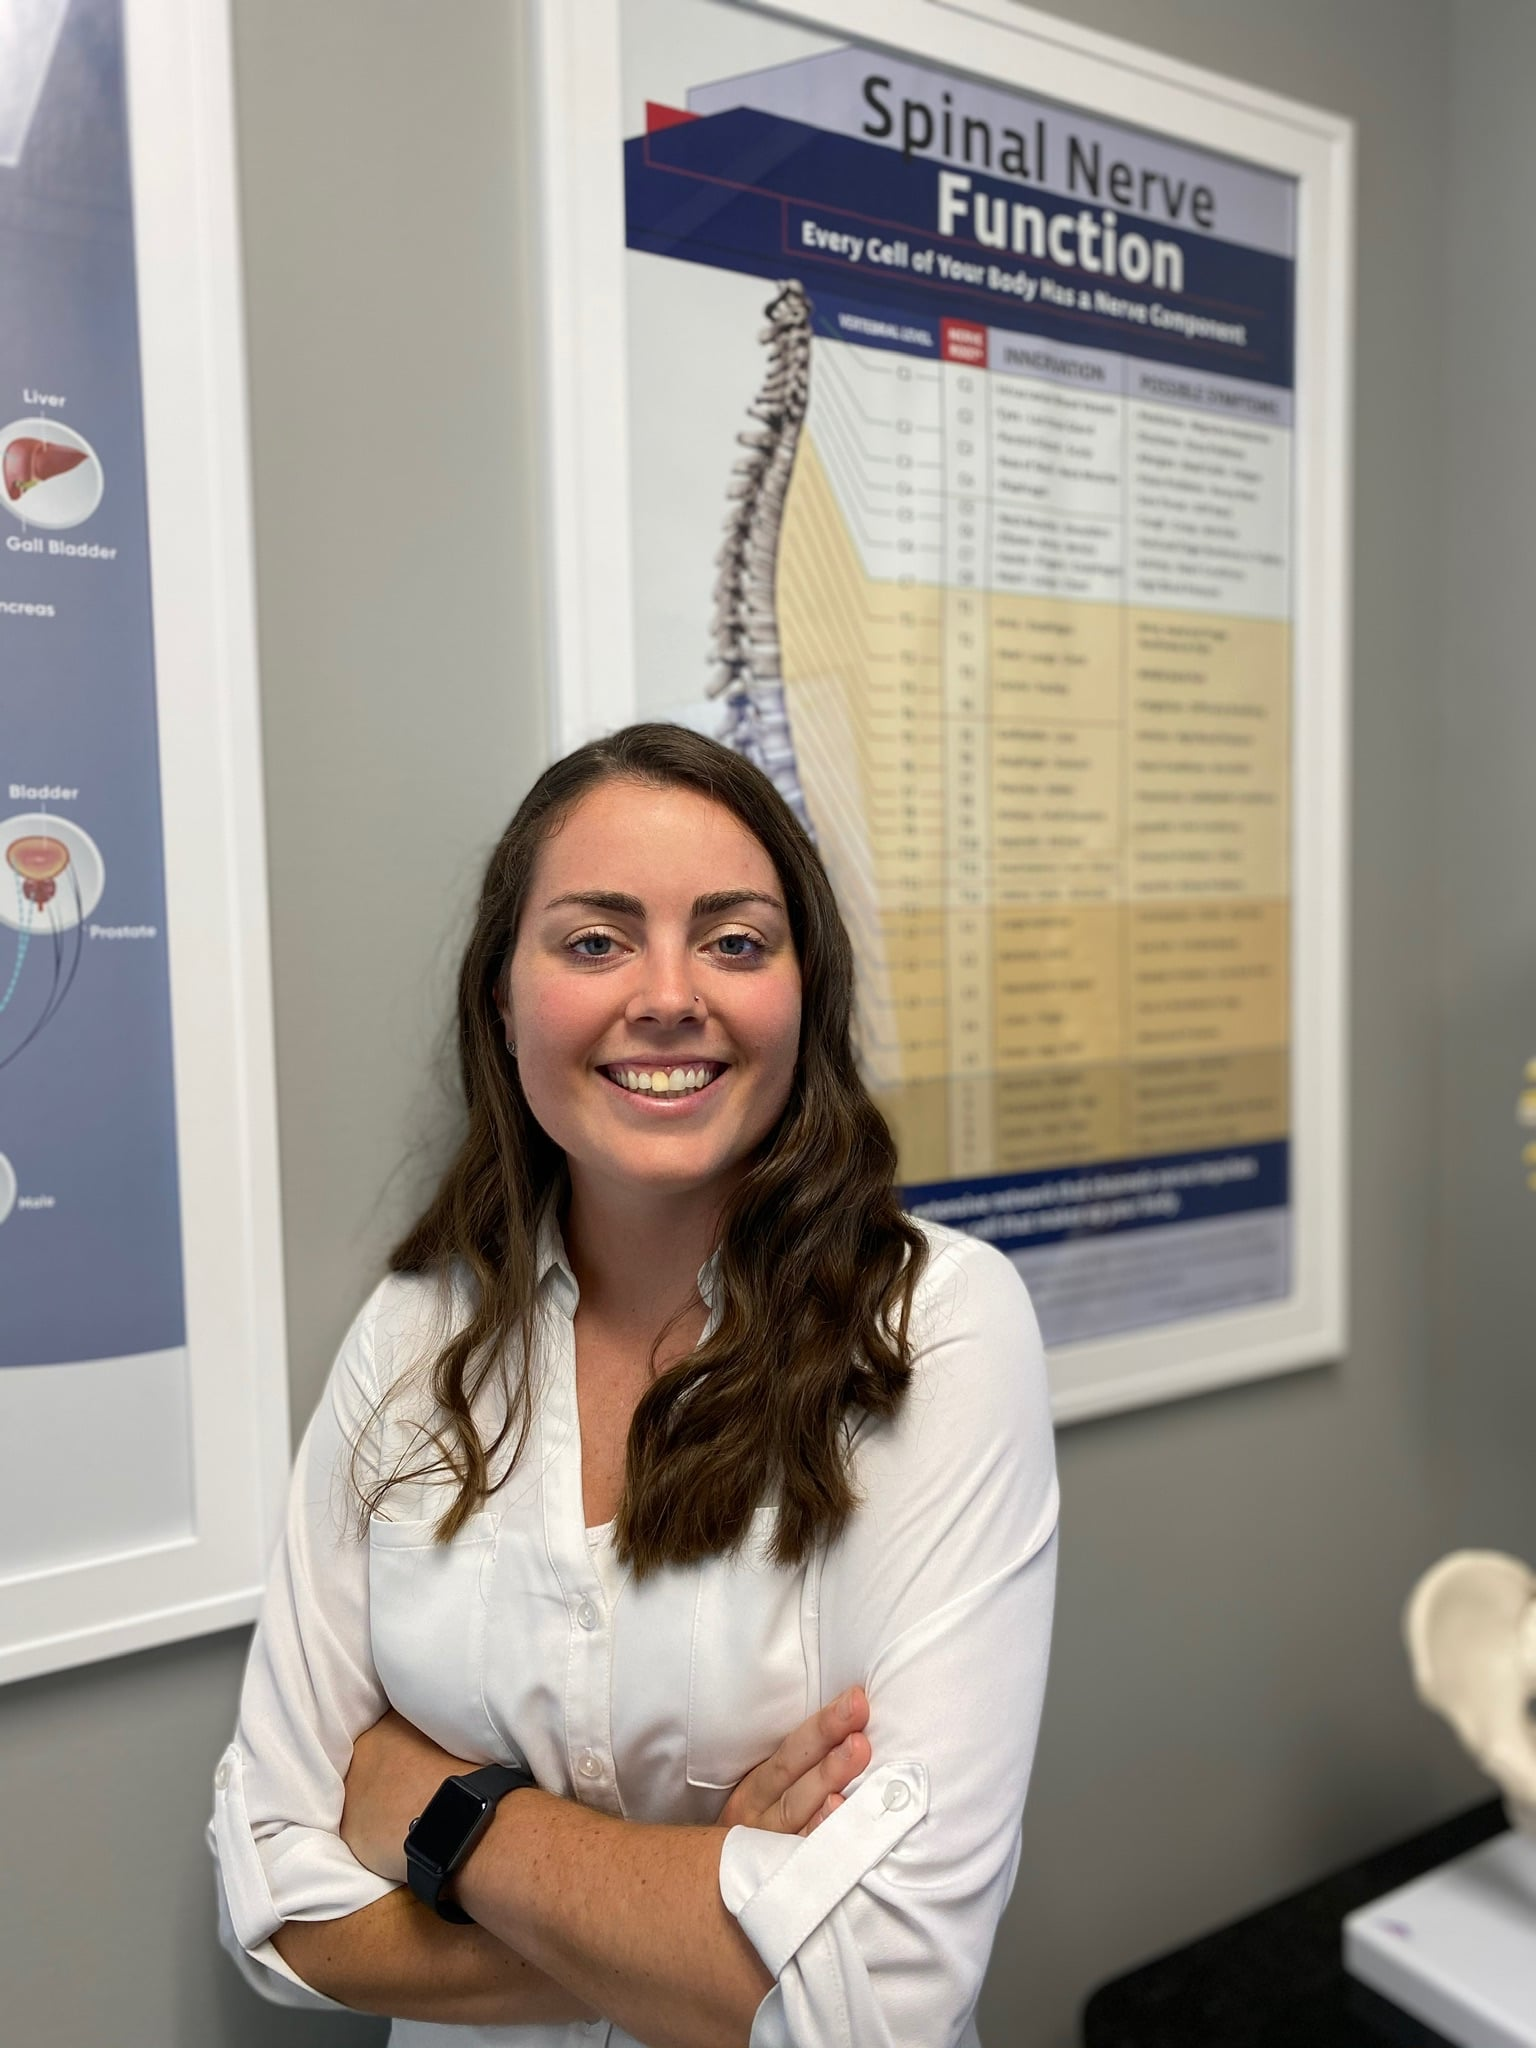 Chiropractor in North Carolina